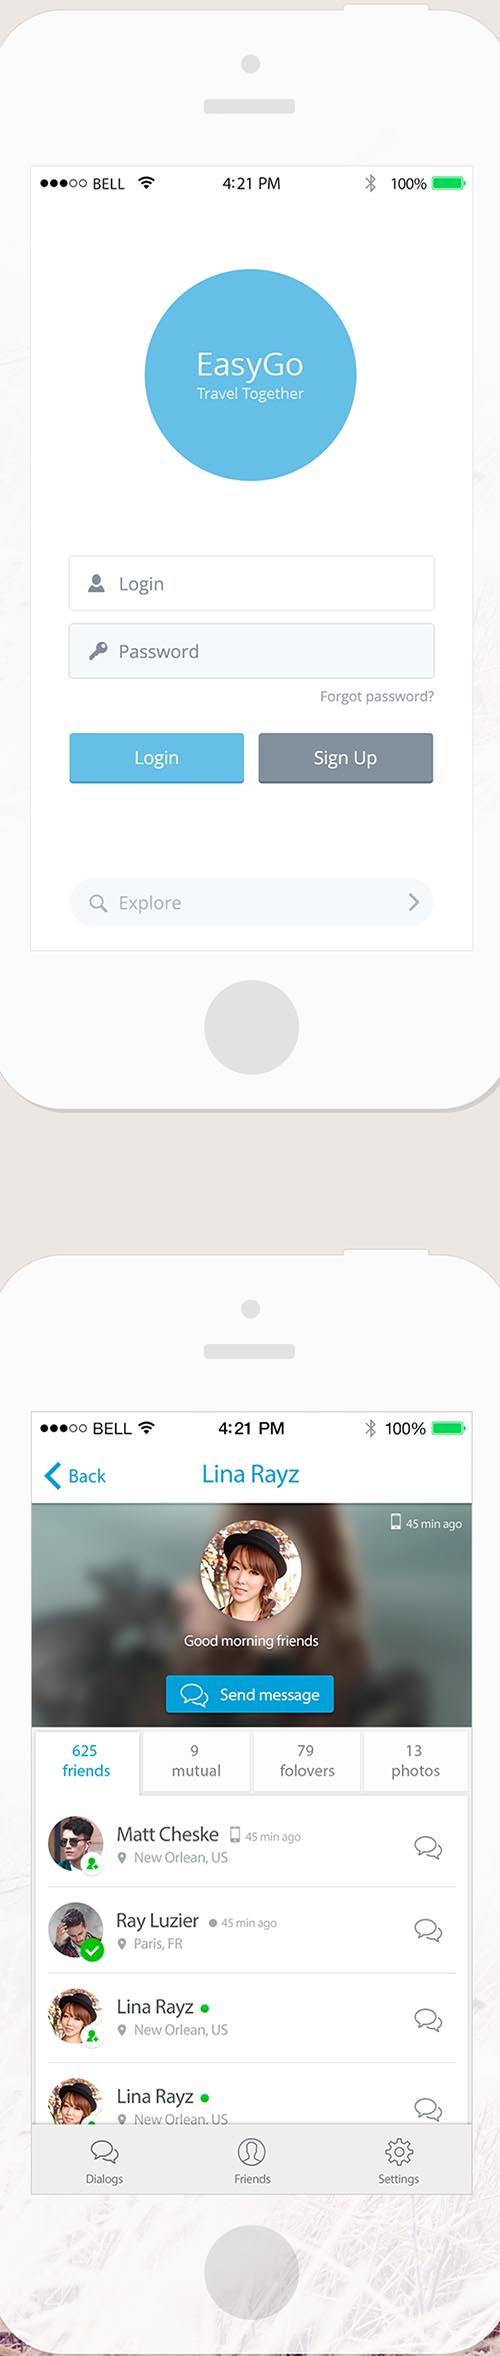 Mobile Apps (portfolio) By Dmitry Soloduha